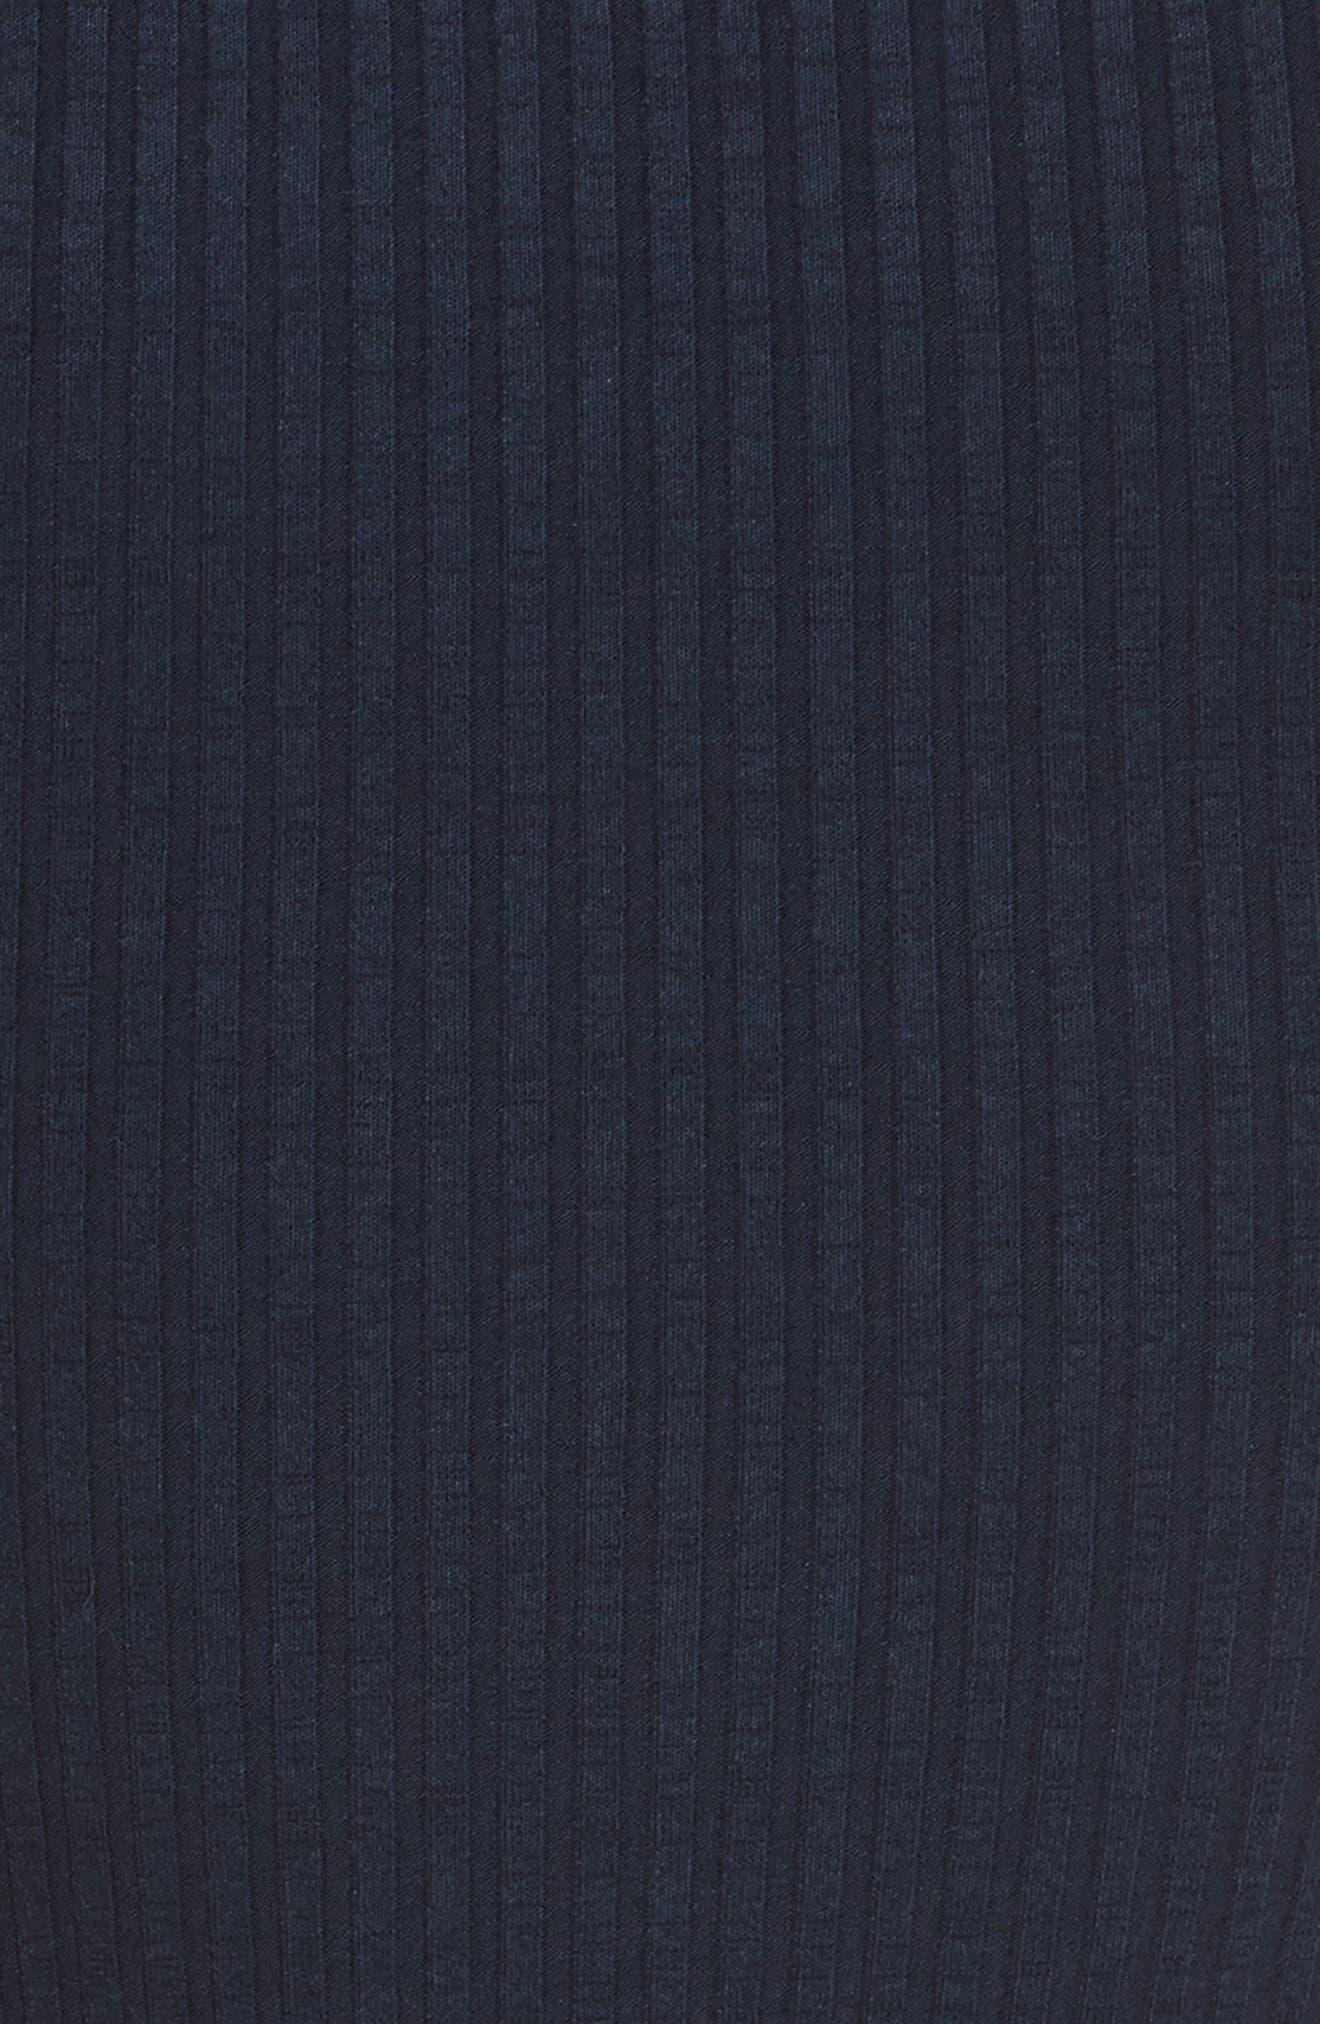 Knotted Rib Knit Midi Dress,                             Alternate thumbnail 6, color,                             Navy